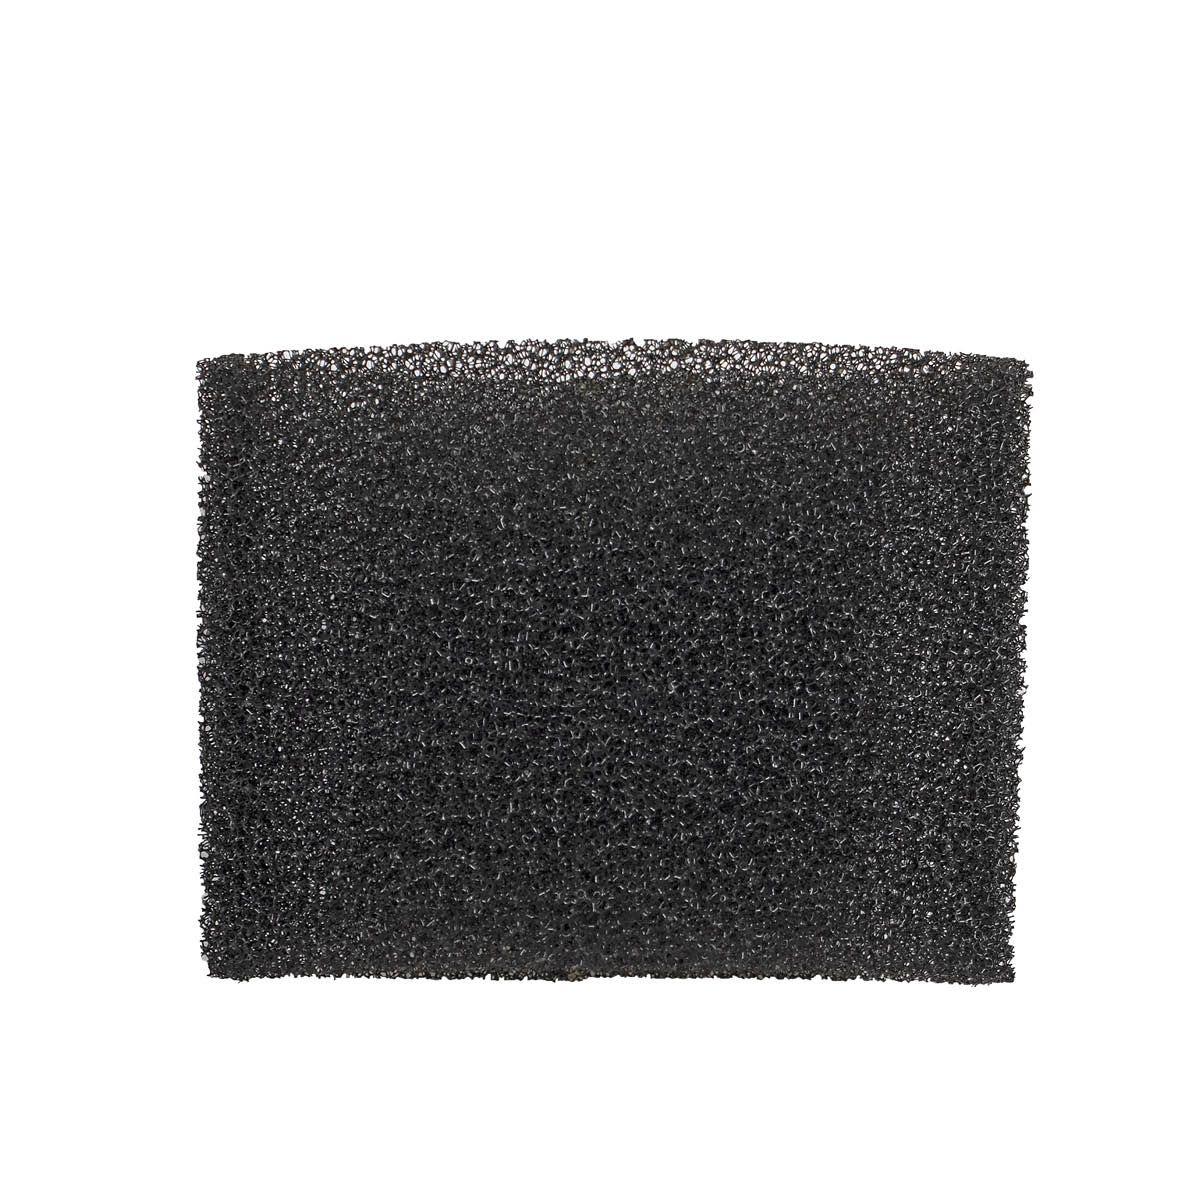 Dewalt Wet & Dry Vacuum Foam Filter